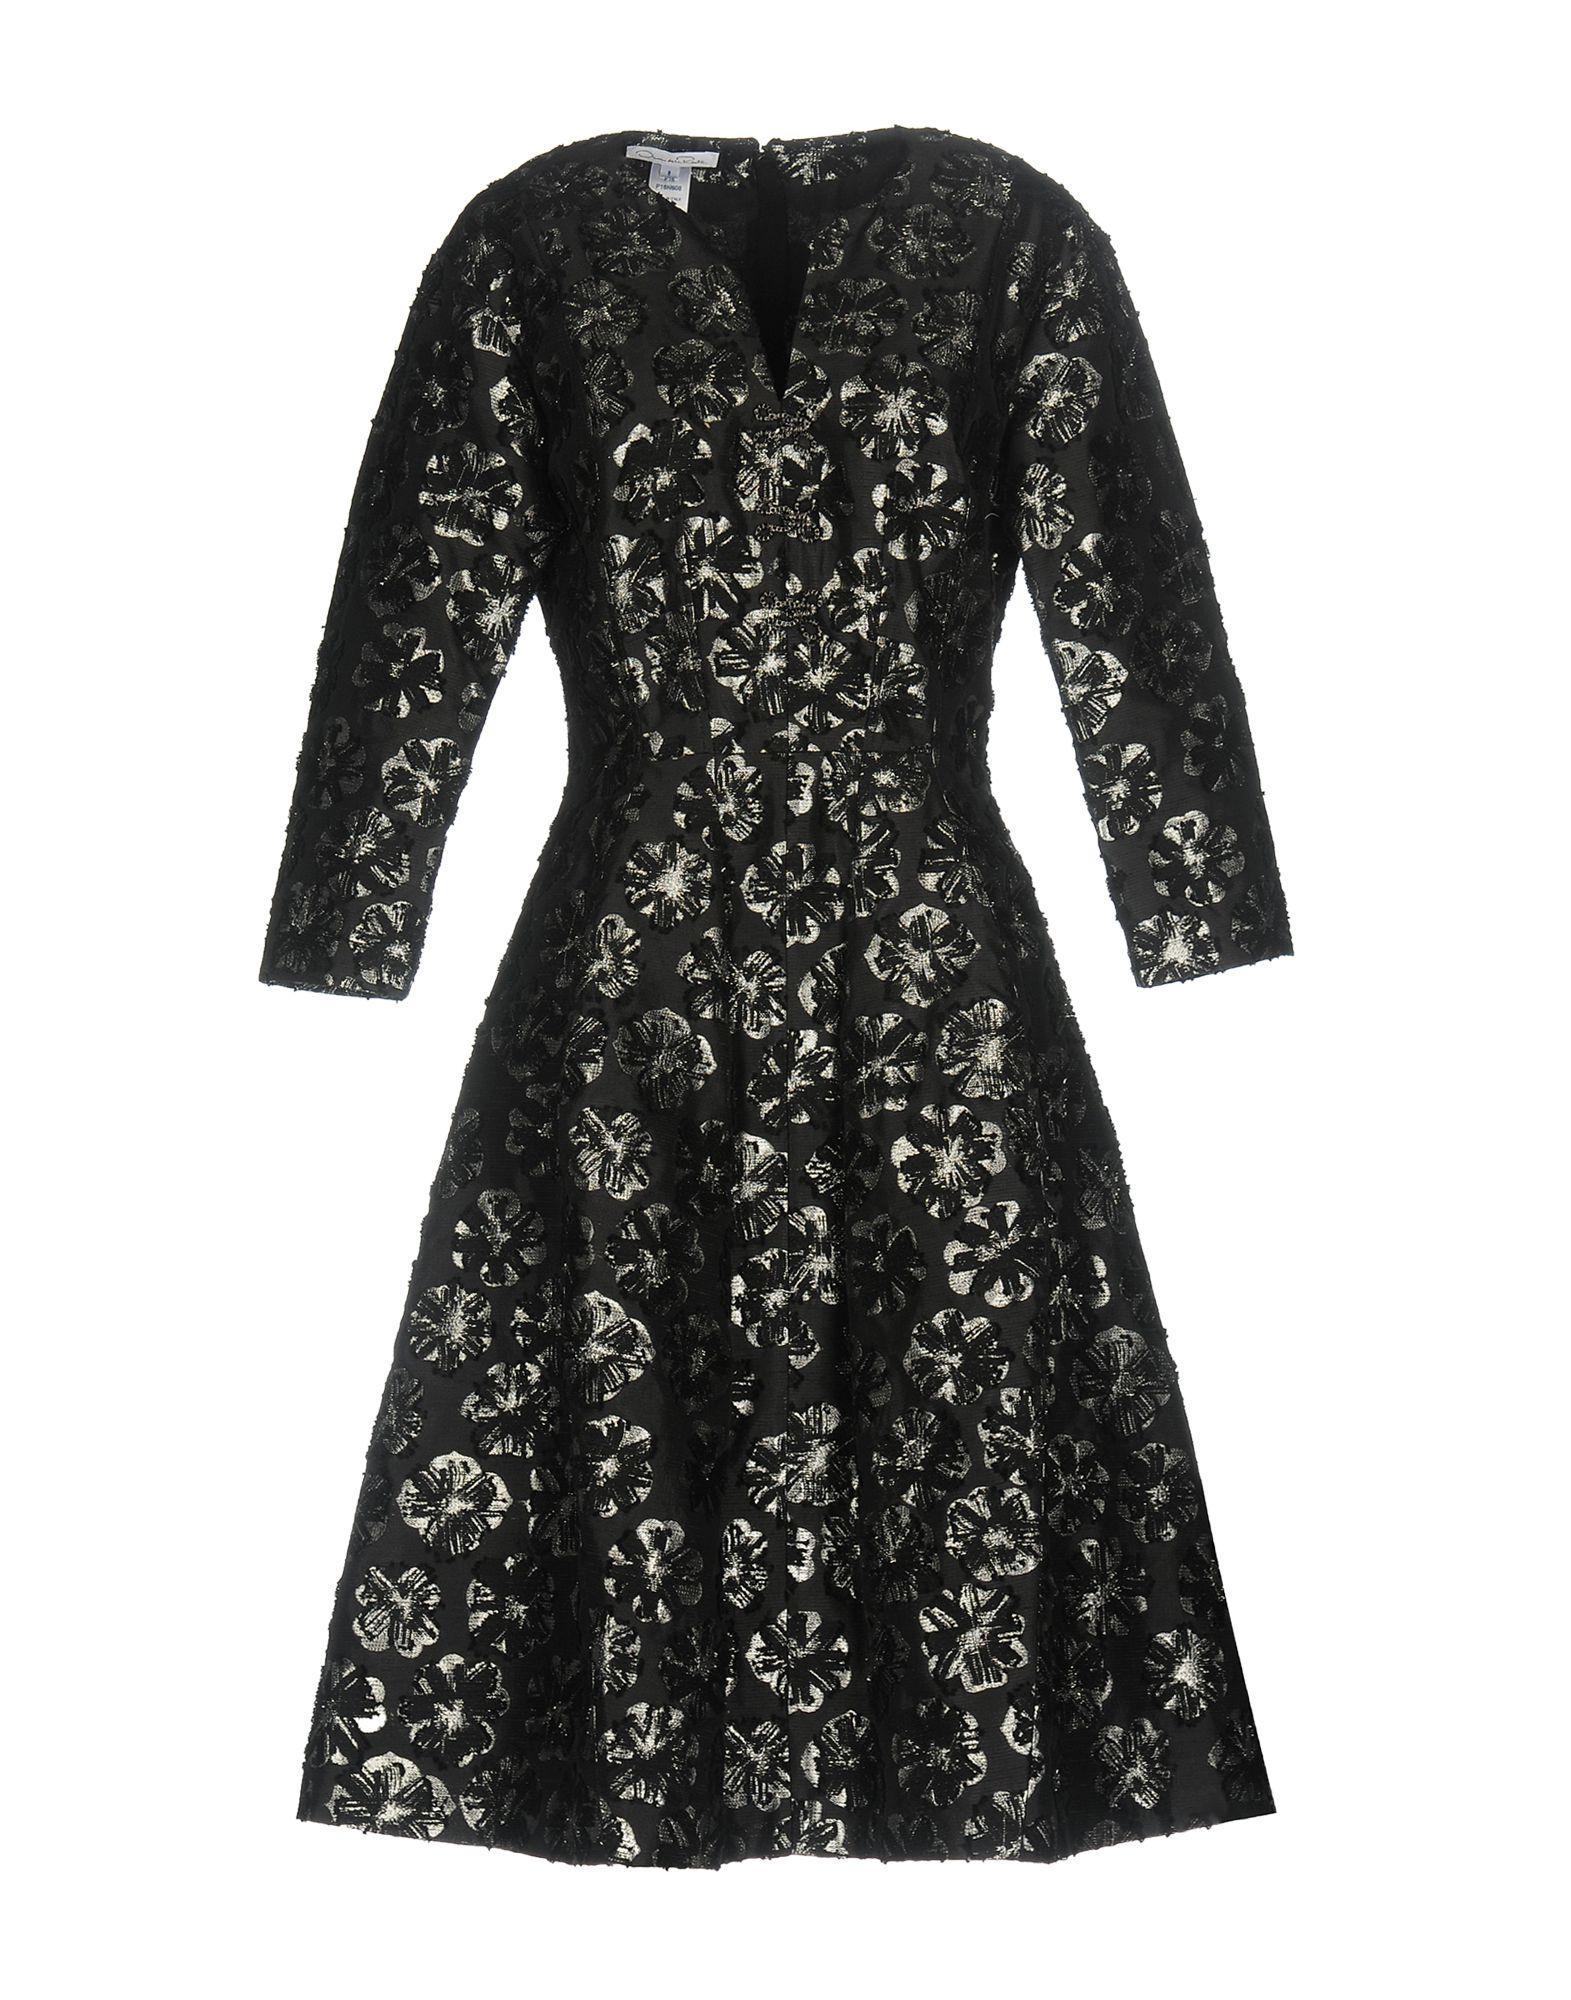 89369cc6468 Oscar De La Renta Knee-Length Dress In Black